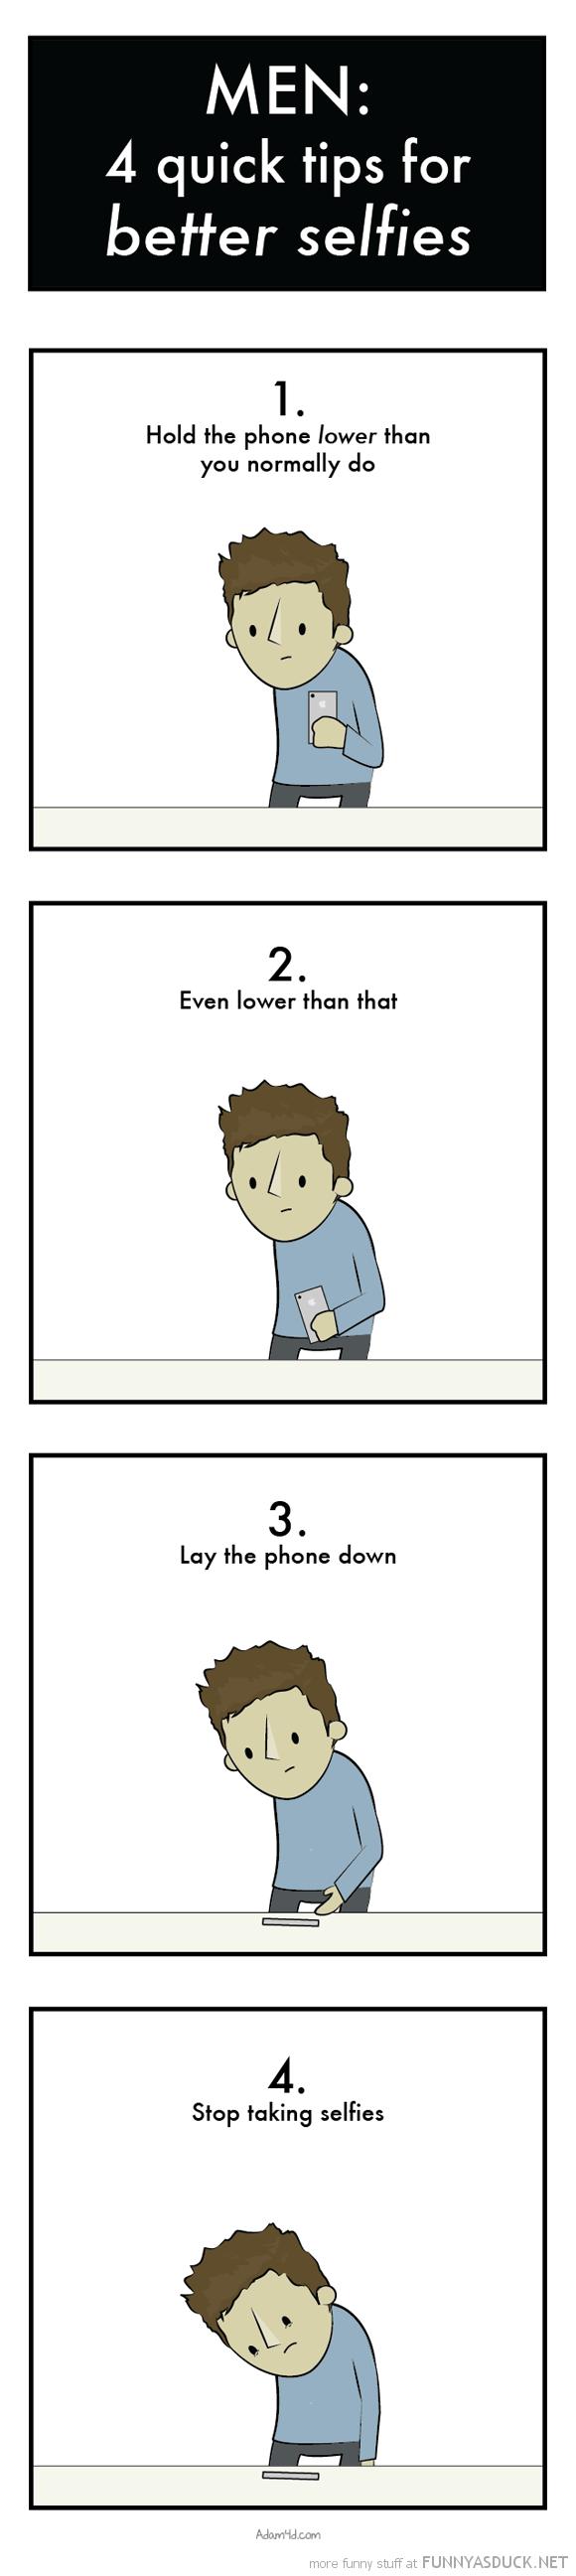 4 Tips